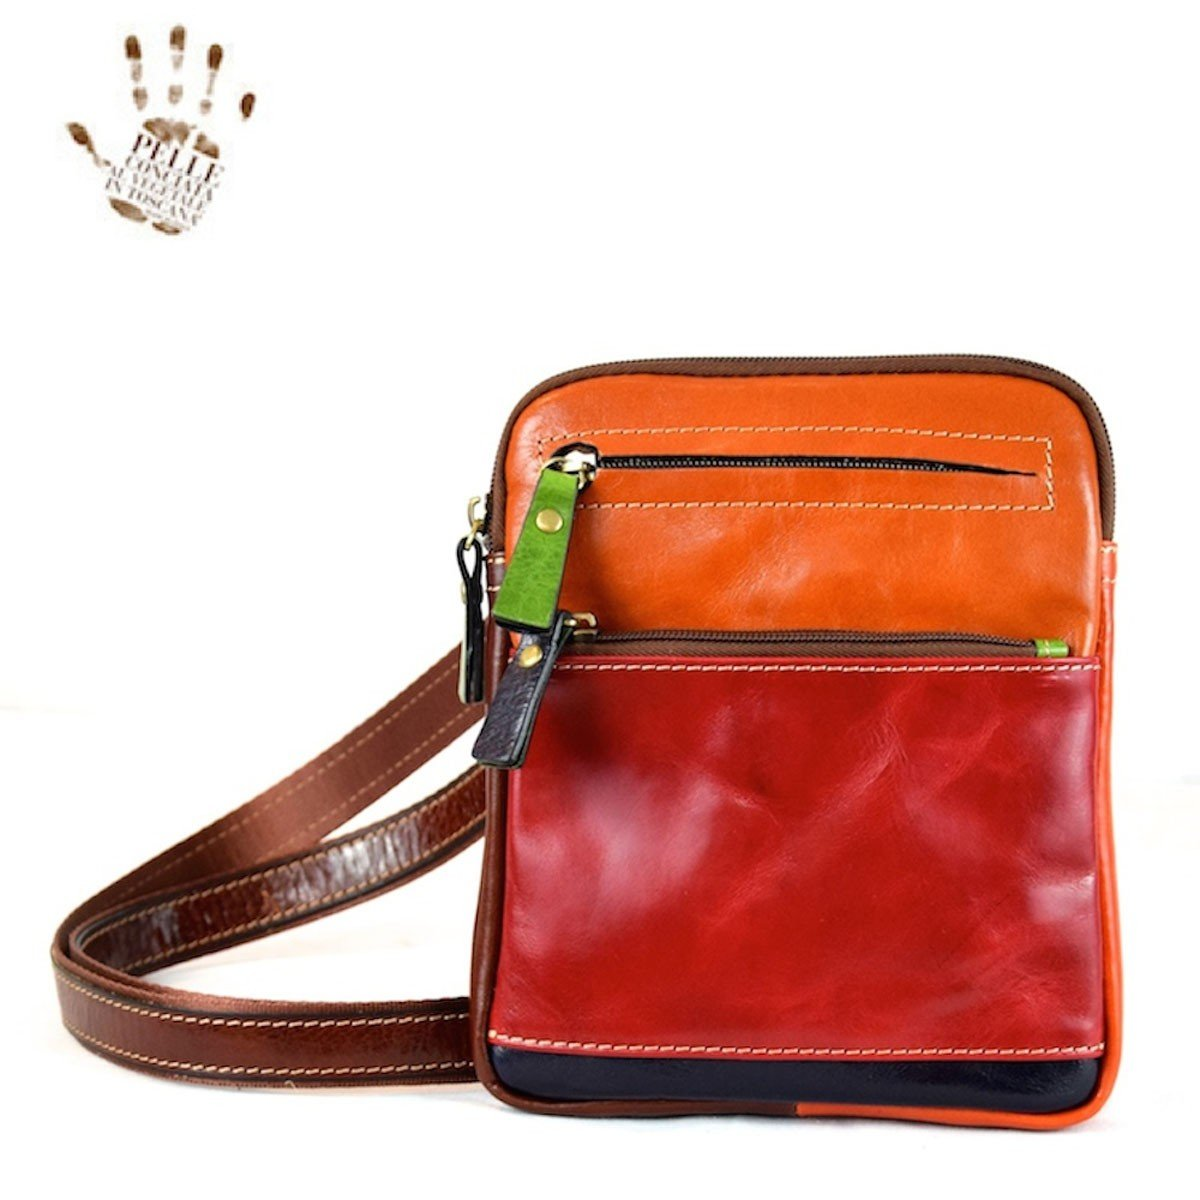 Dream Leather Bags Made in Italy Genuine Leather メンズ 547-13 US サイズ: 1 M US   B07BTGW1X5